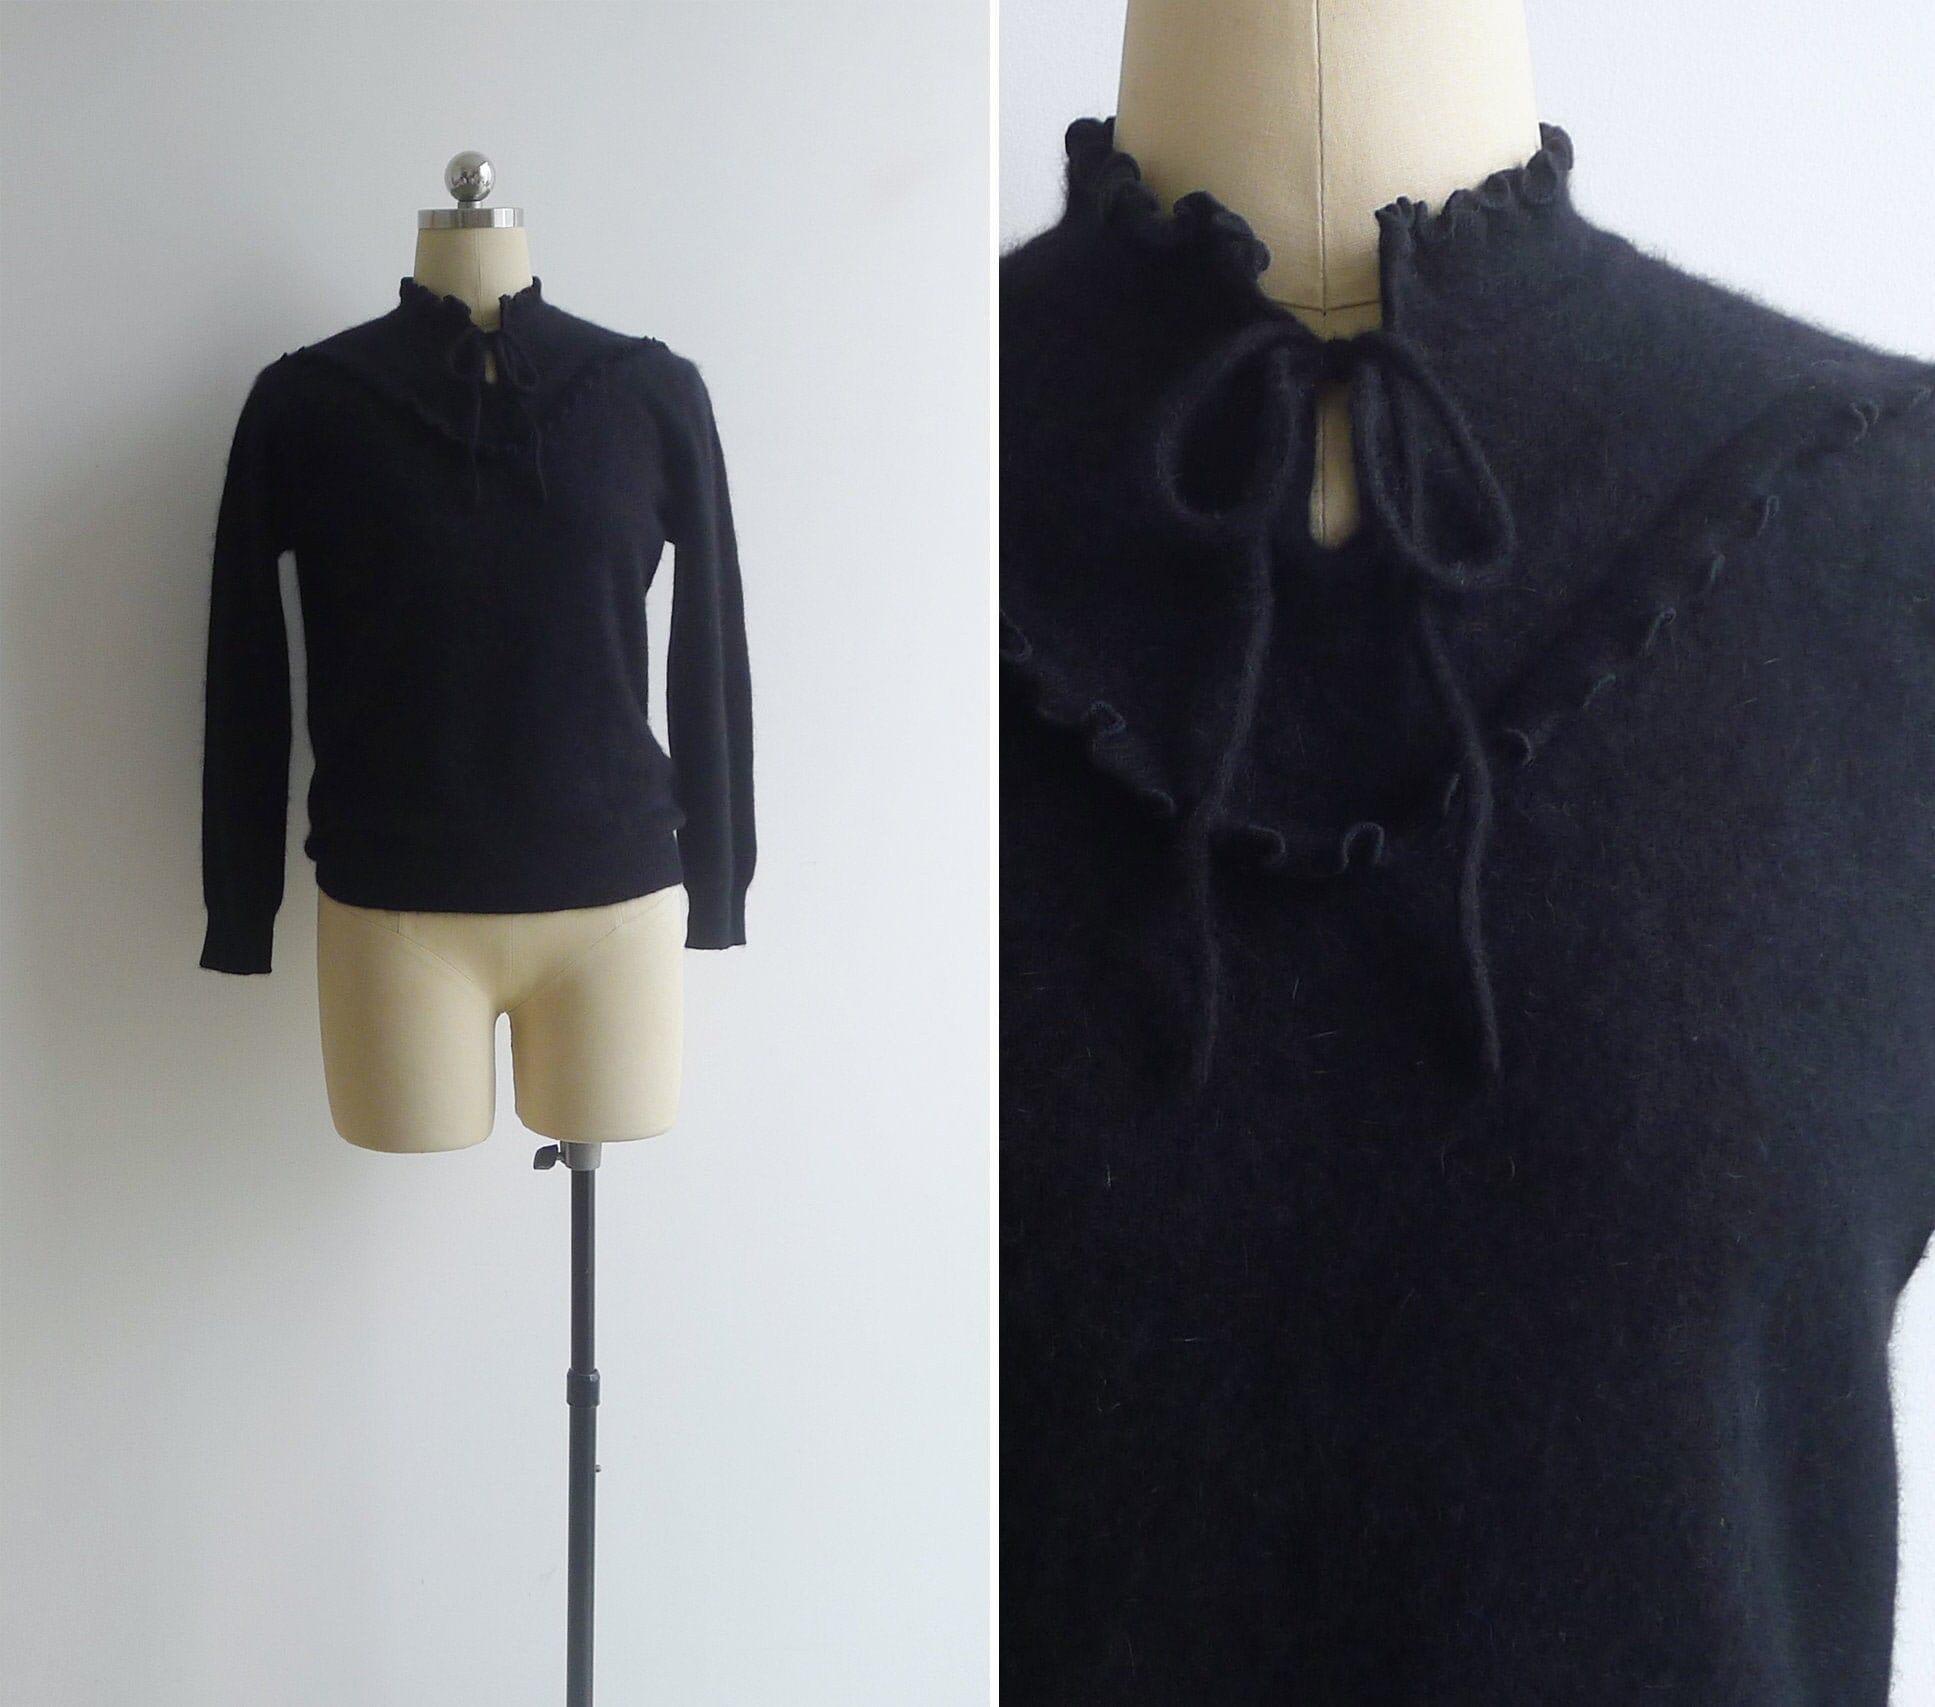 80s Sweatshirts, Sweaters, Vests | Women Vintage 80s Black Wool Ribbon Tie Ruffled Sweater Top S M L $42.00 AT vintagedancer.com